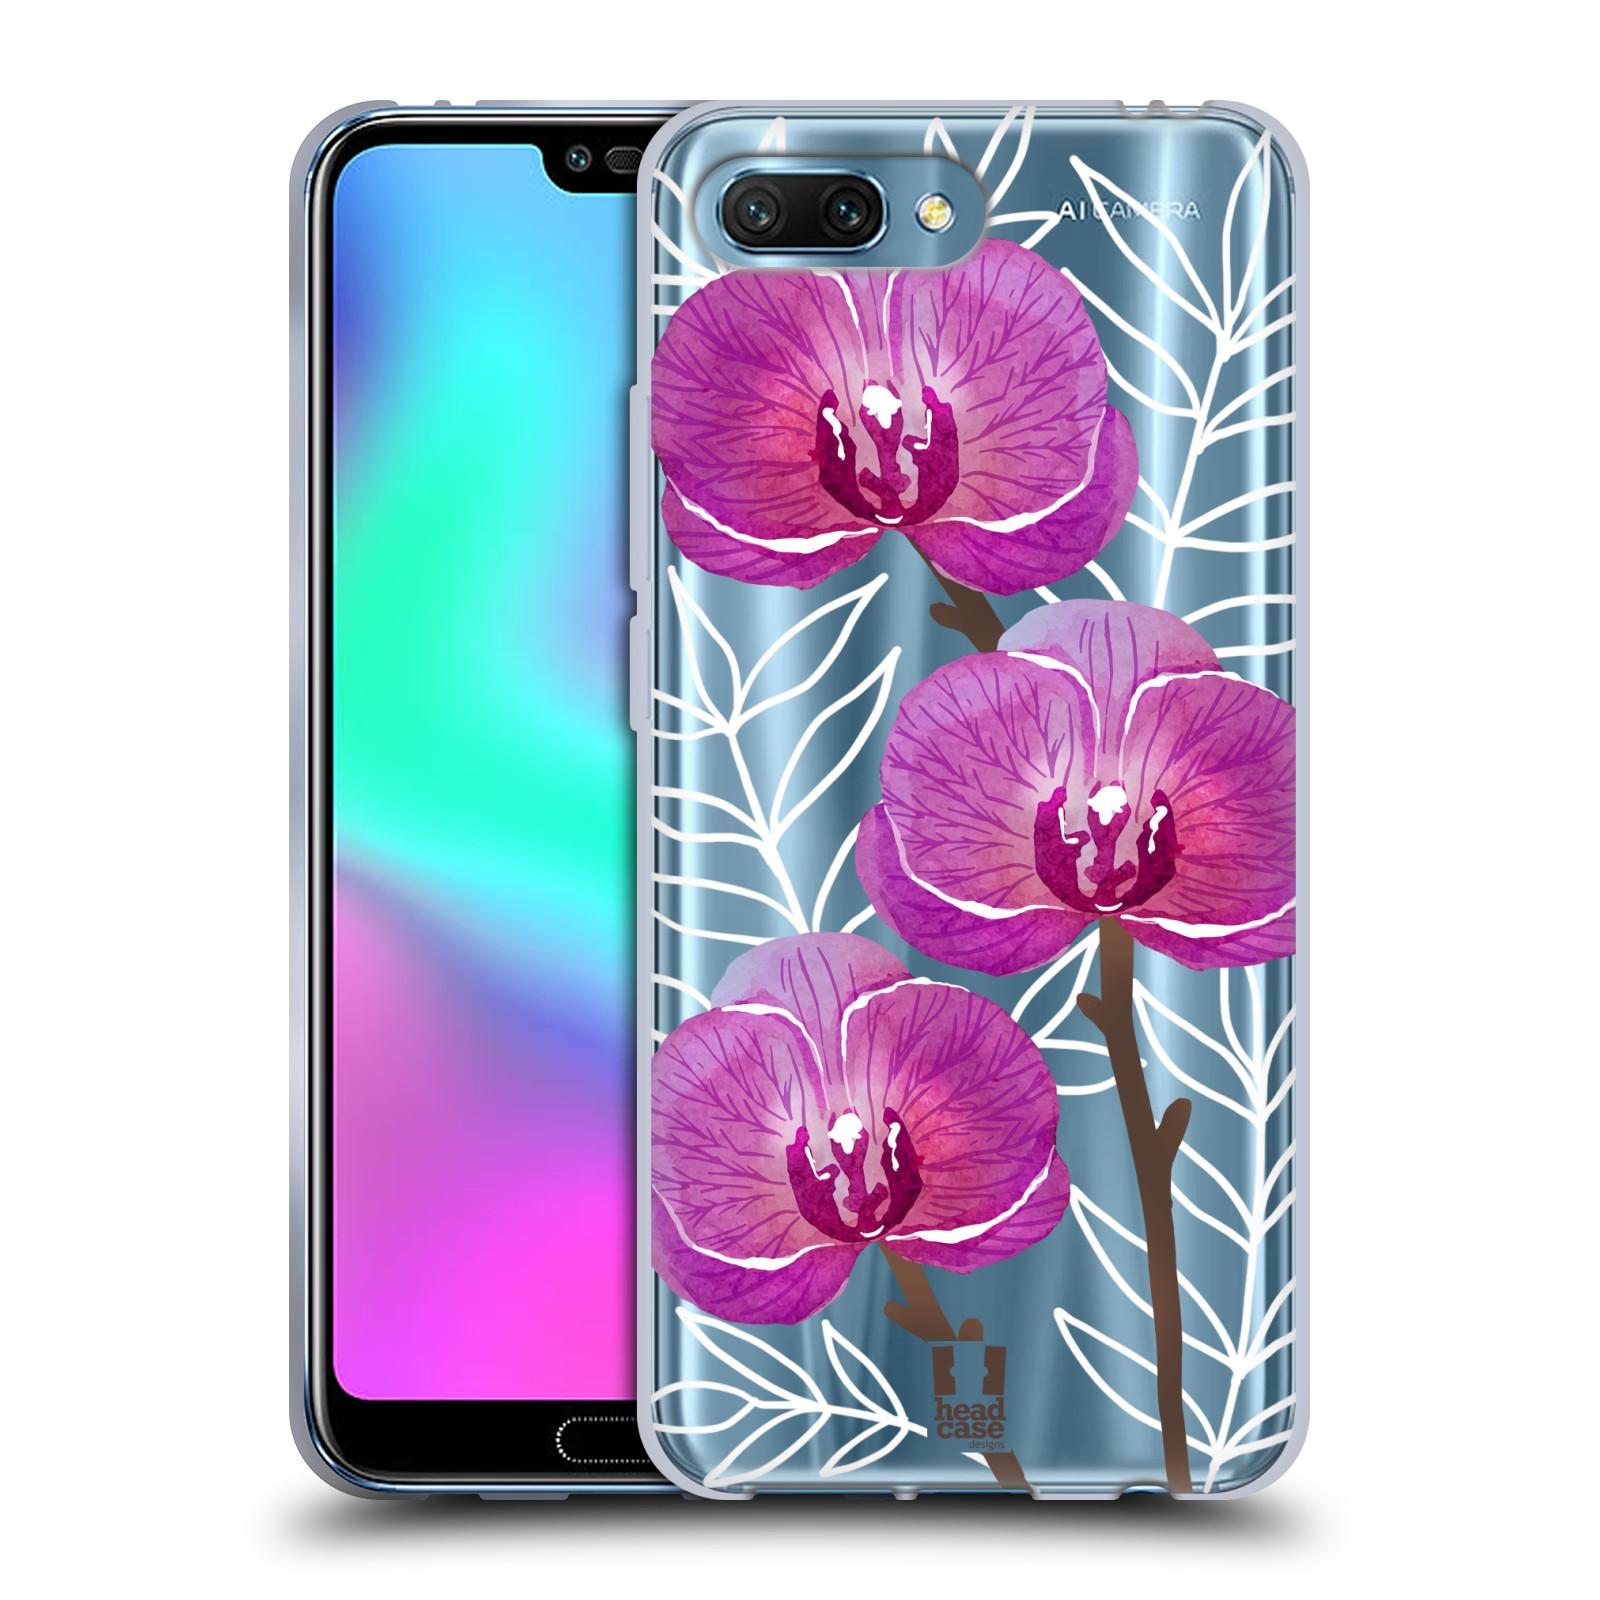 Silikonové pouzdro na mobil Honor 10 - Head Case - Hezoučké kvítky - průhledné